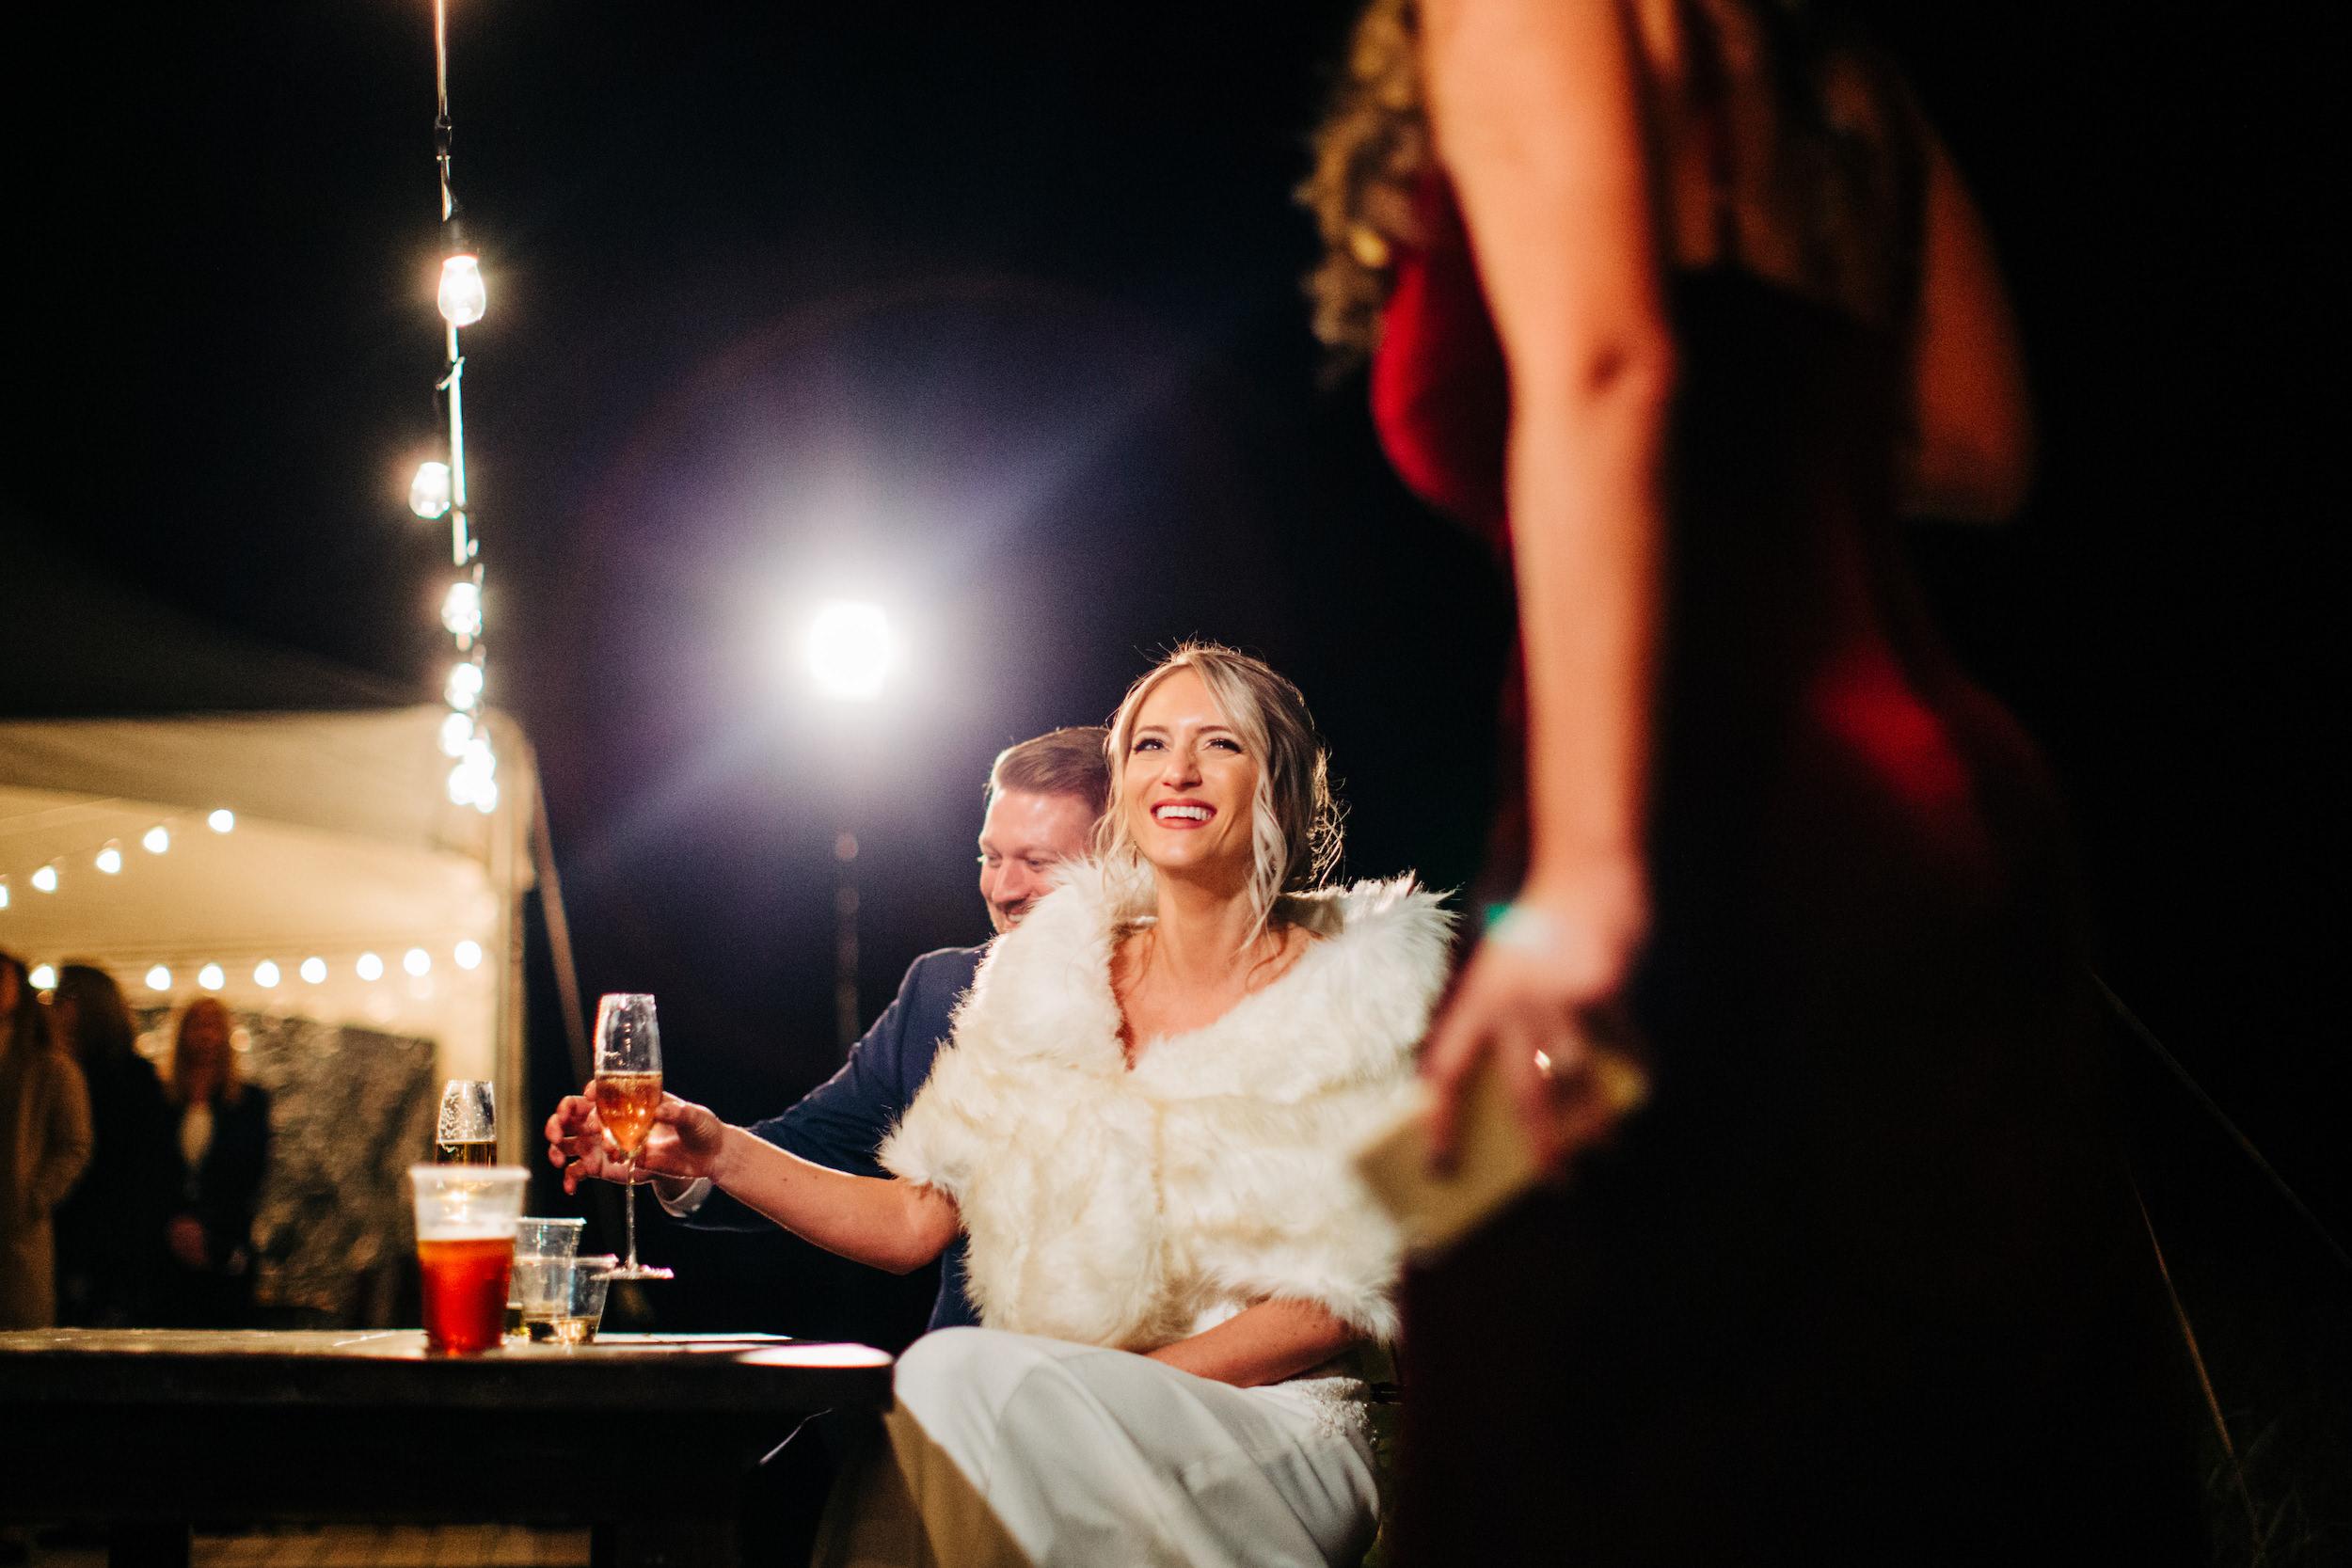 Ricky & Brittney - Reception - Jake & Katie Photography_186.jpg